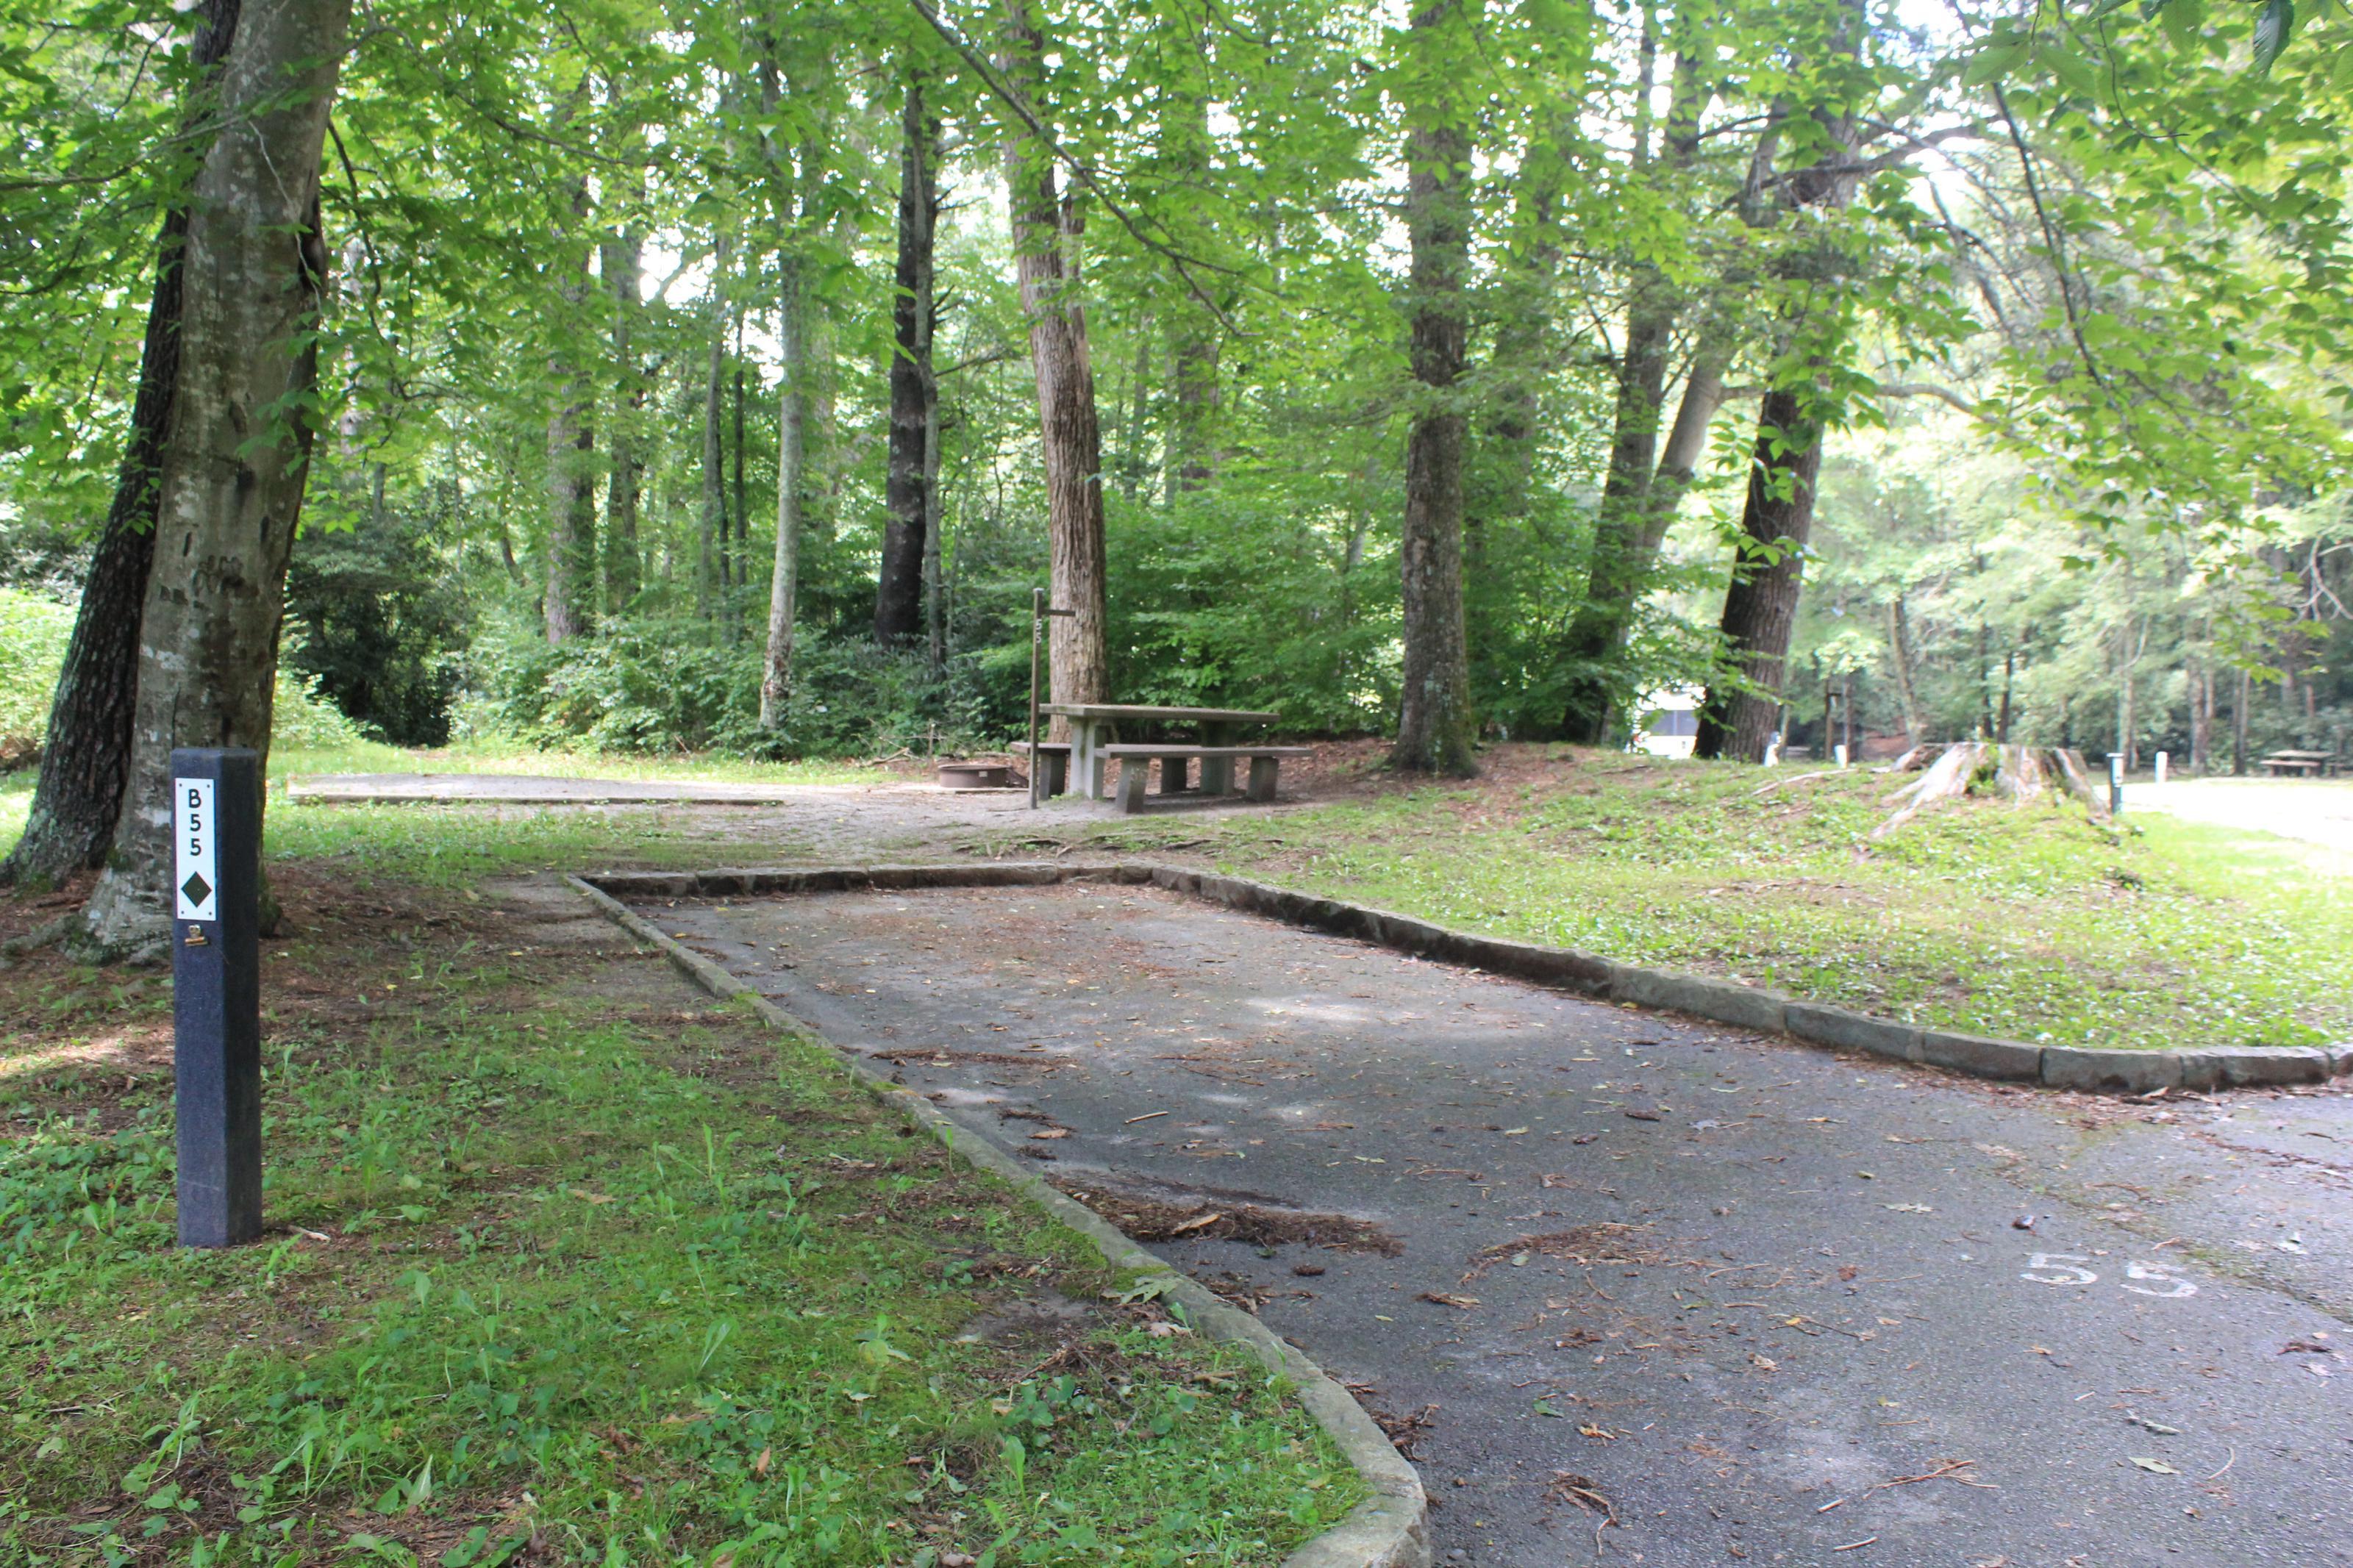 B Loop Site 55 - Tent Nonelectric